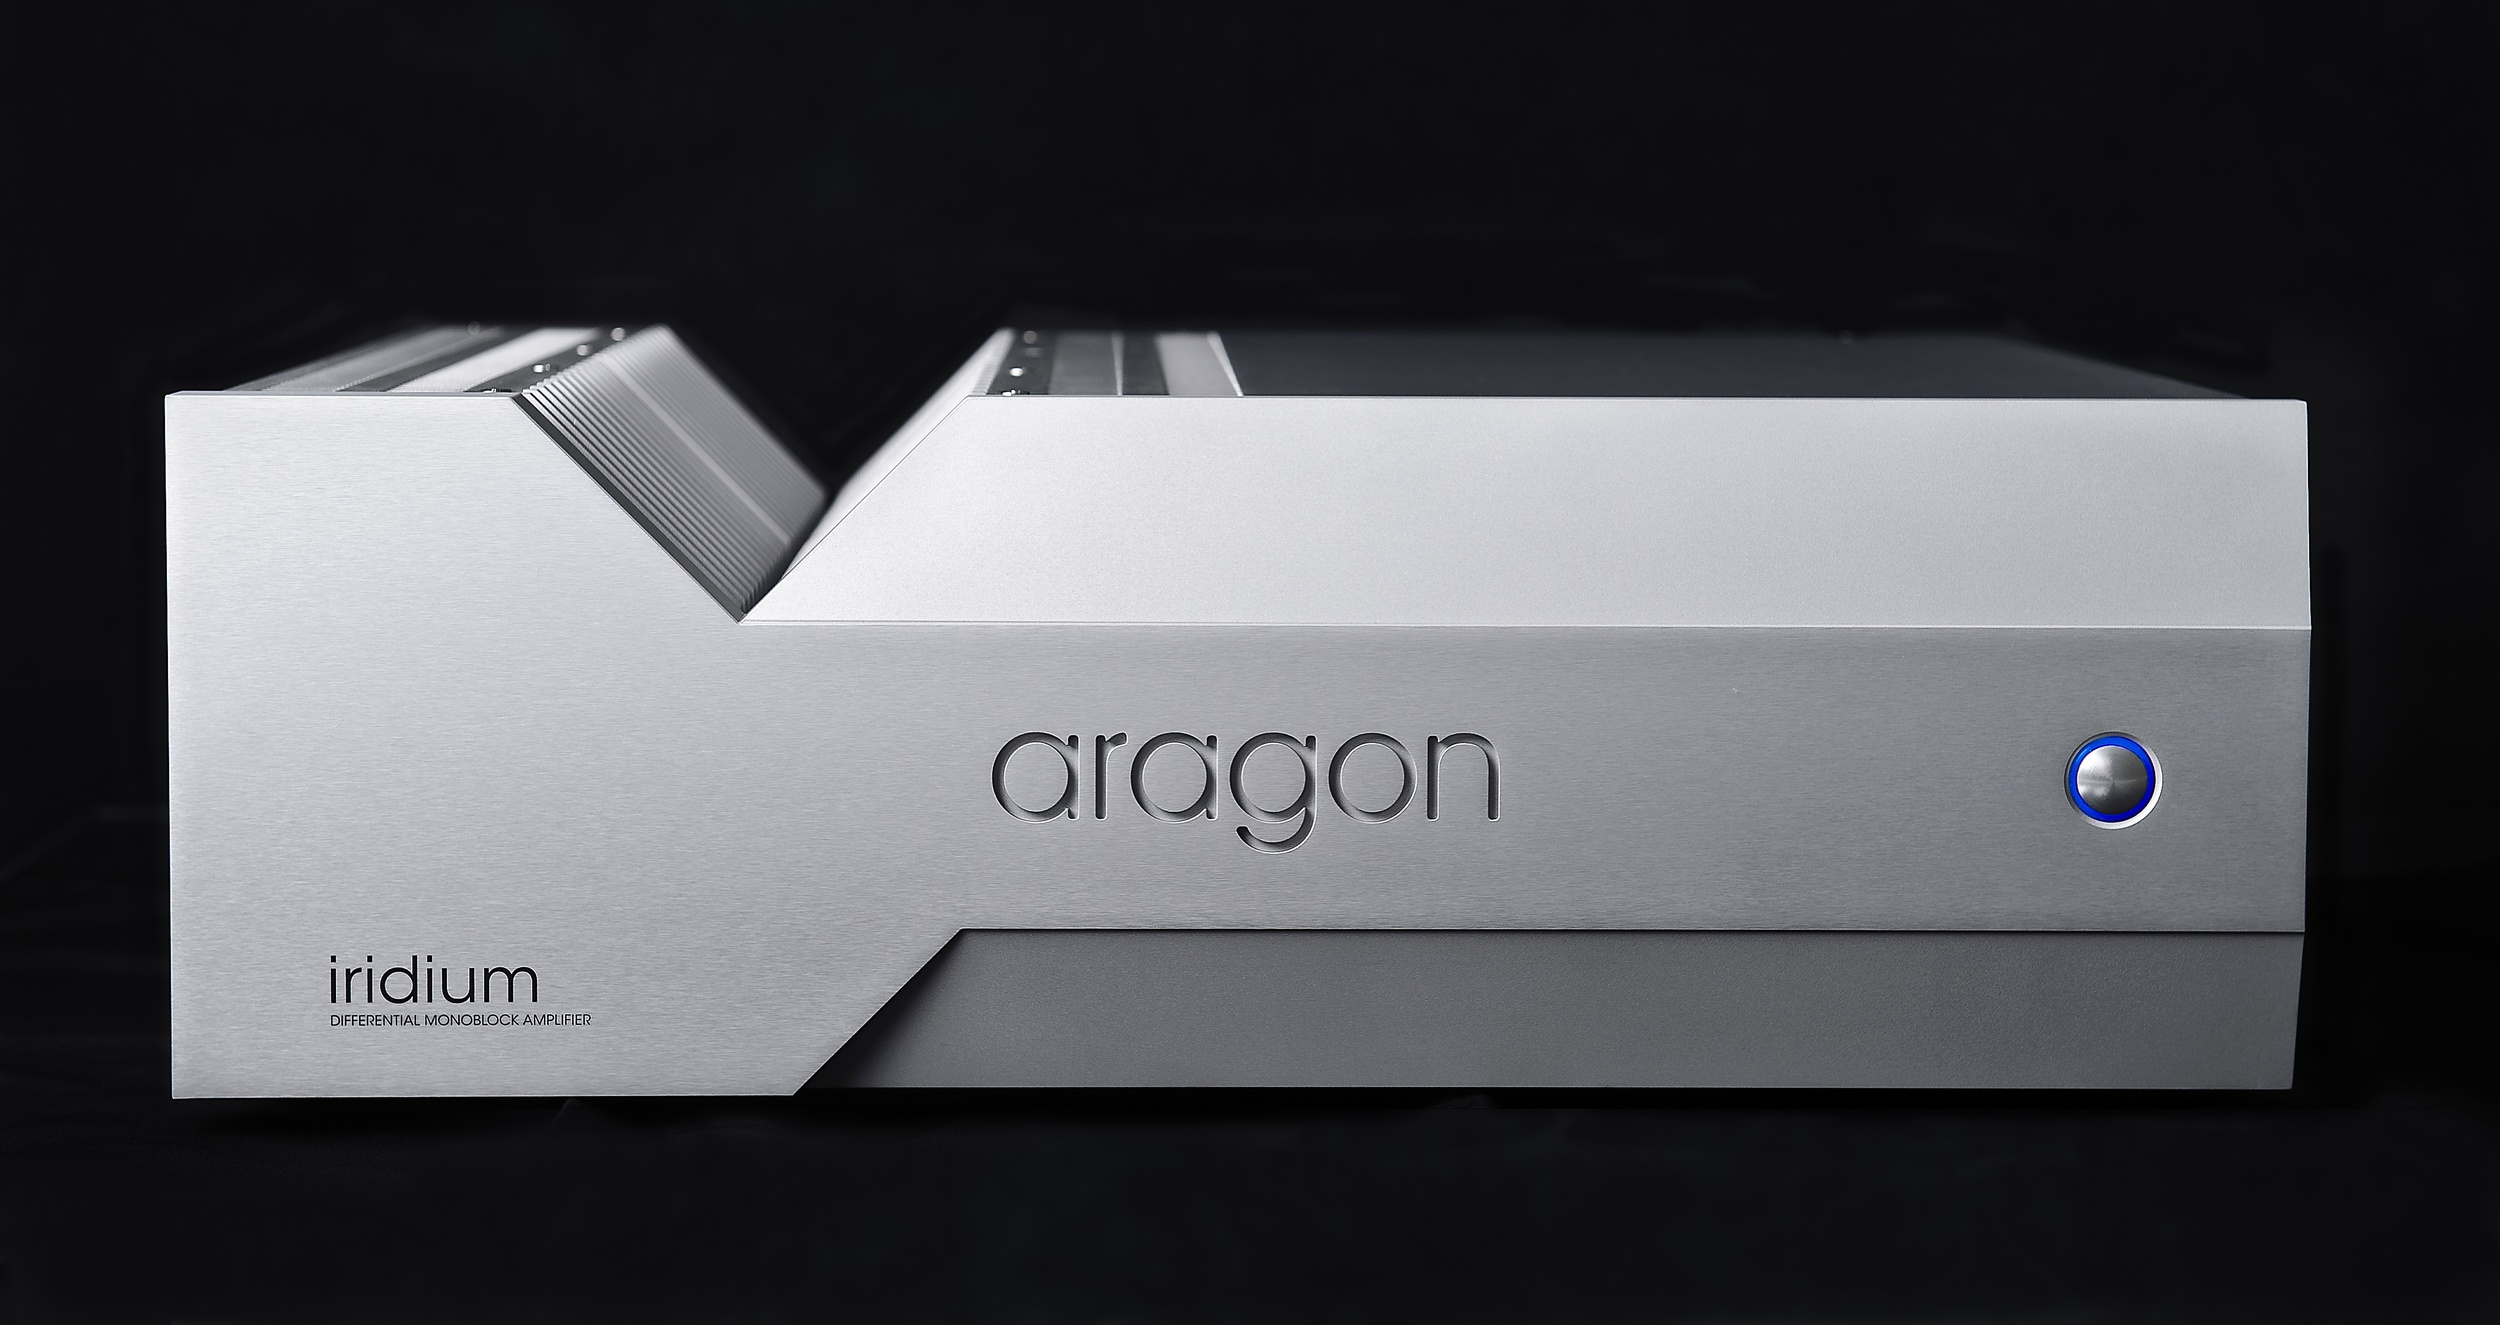 Aragon_57_crop.jpg